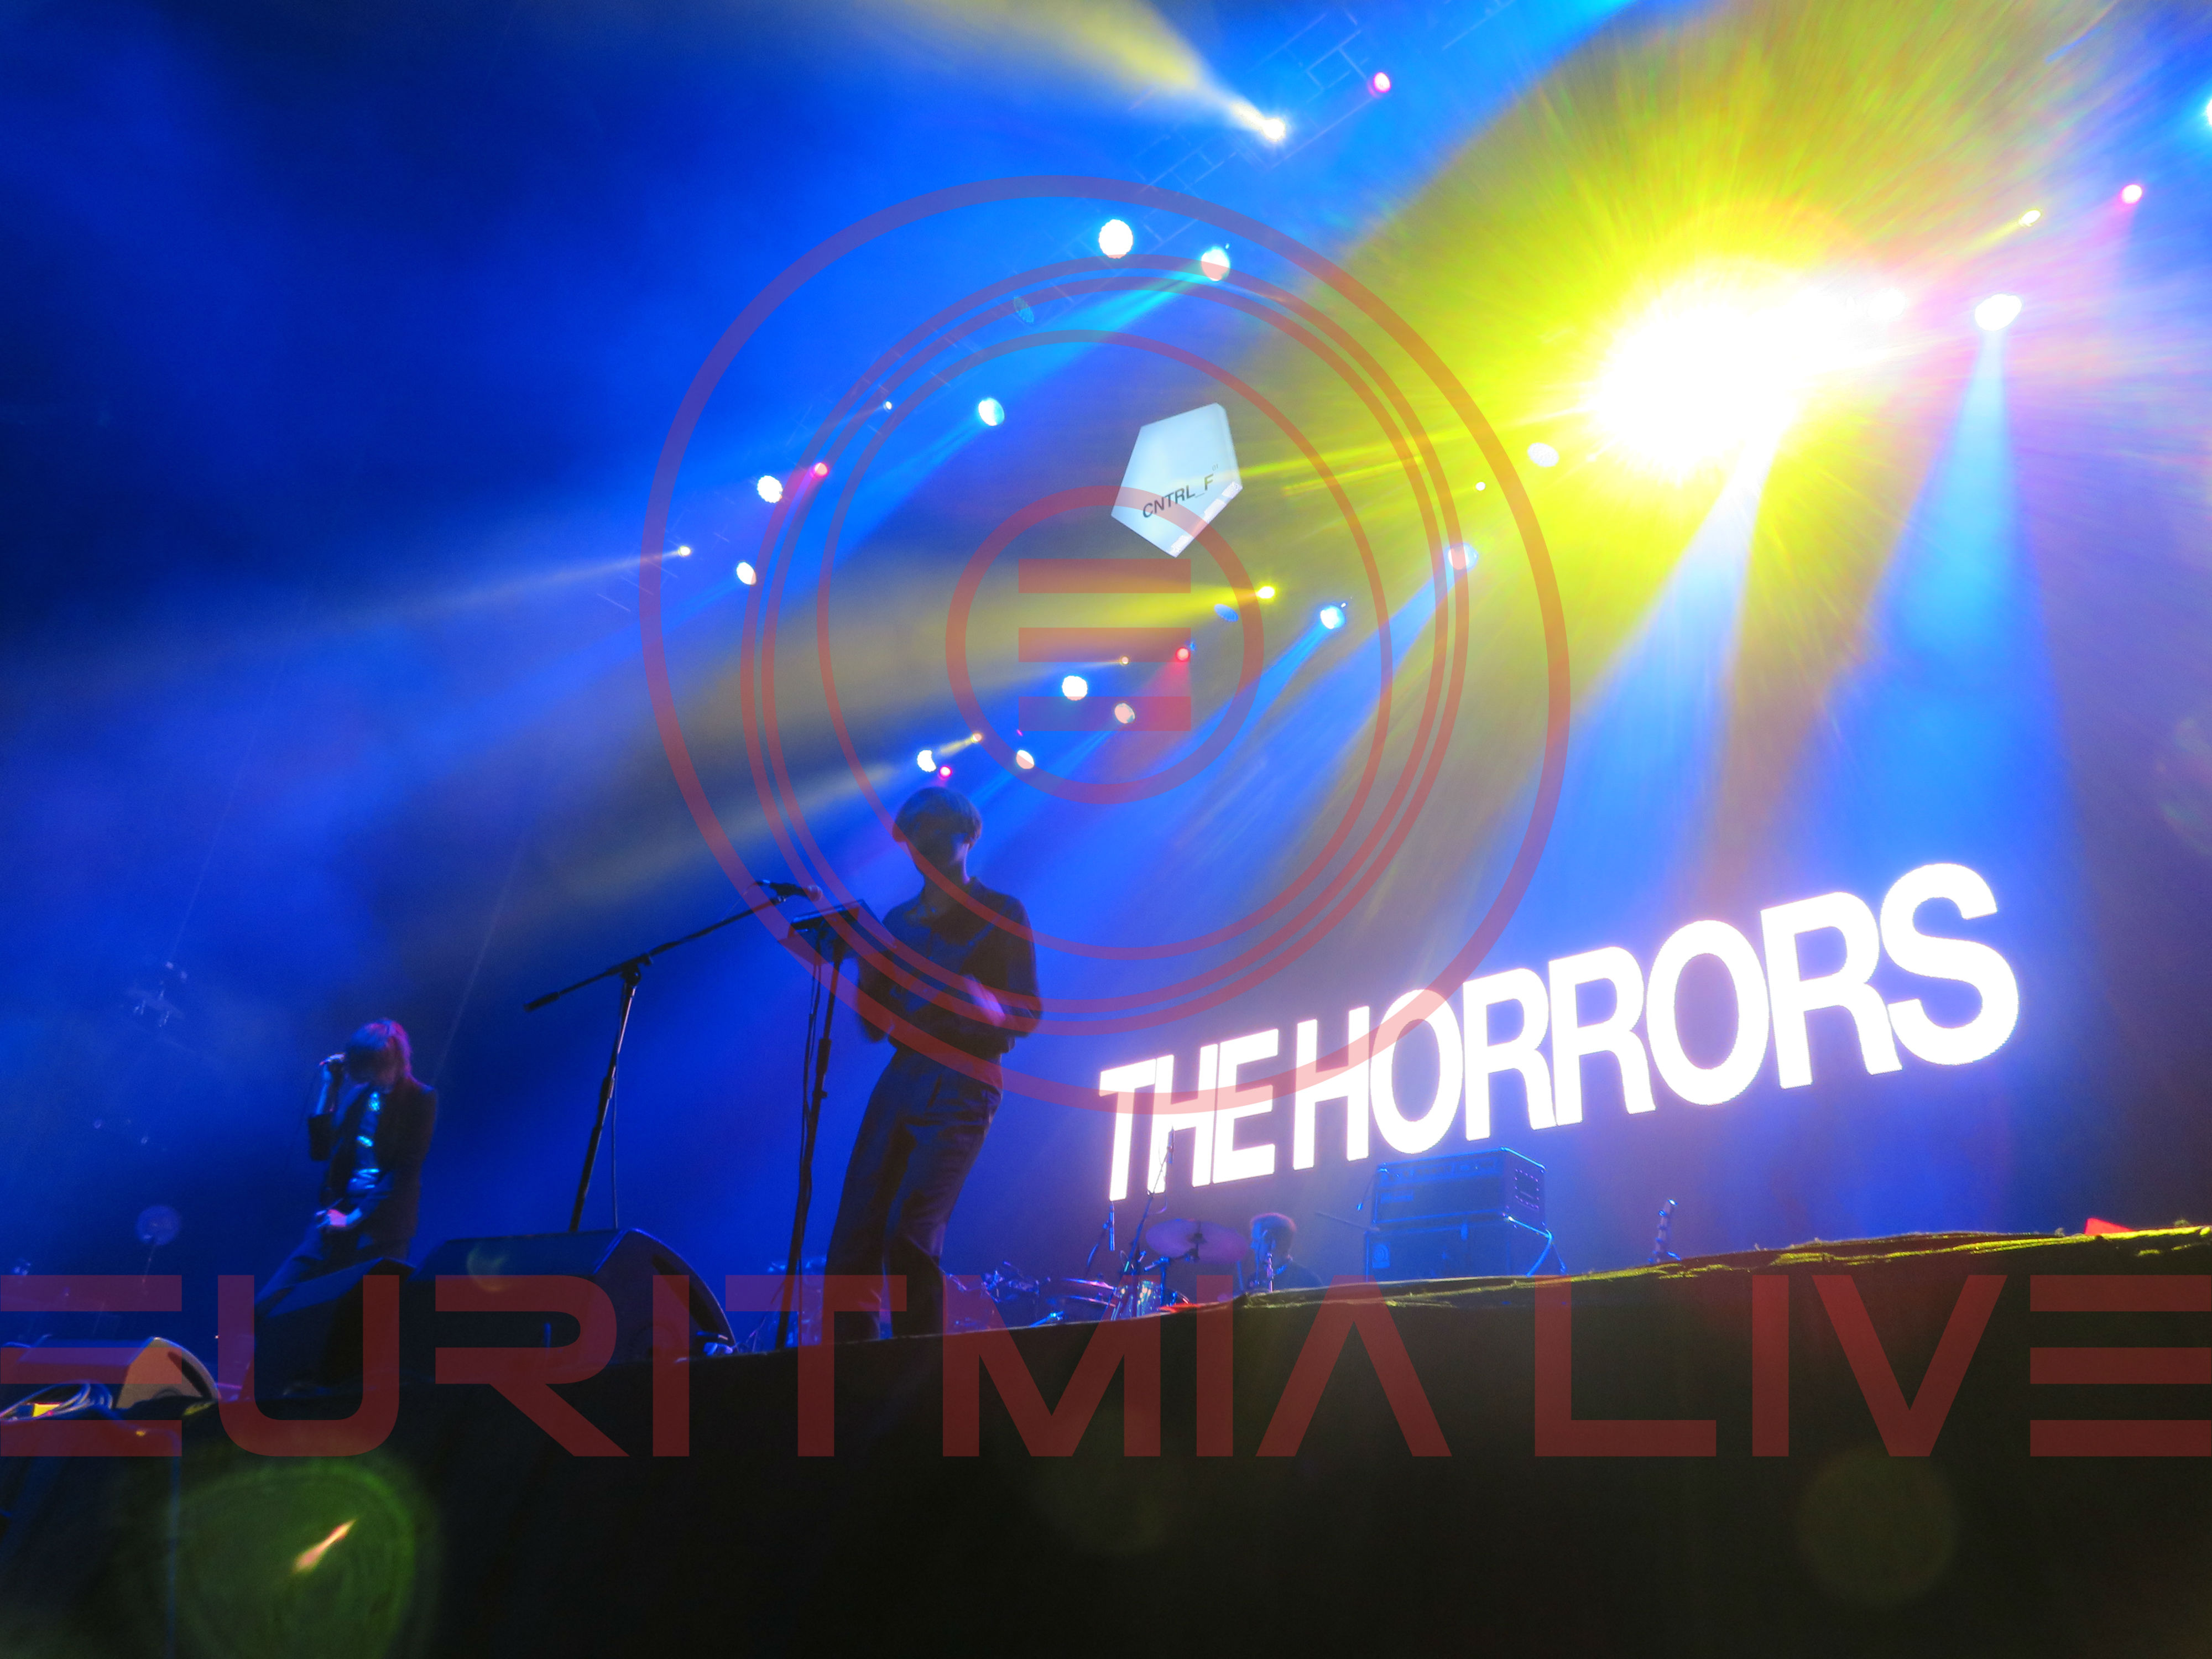 horrors2